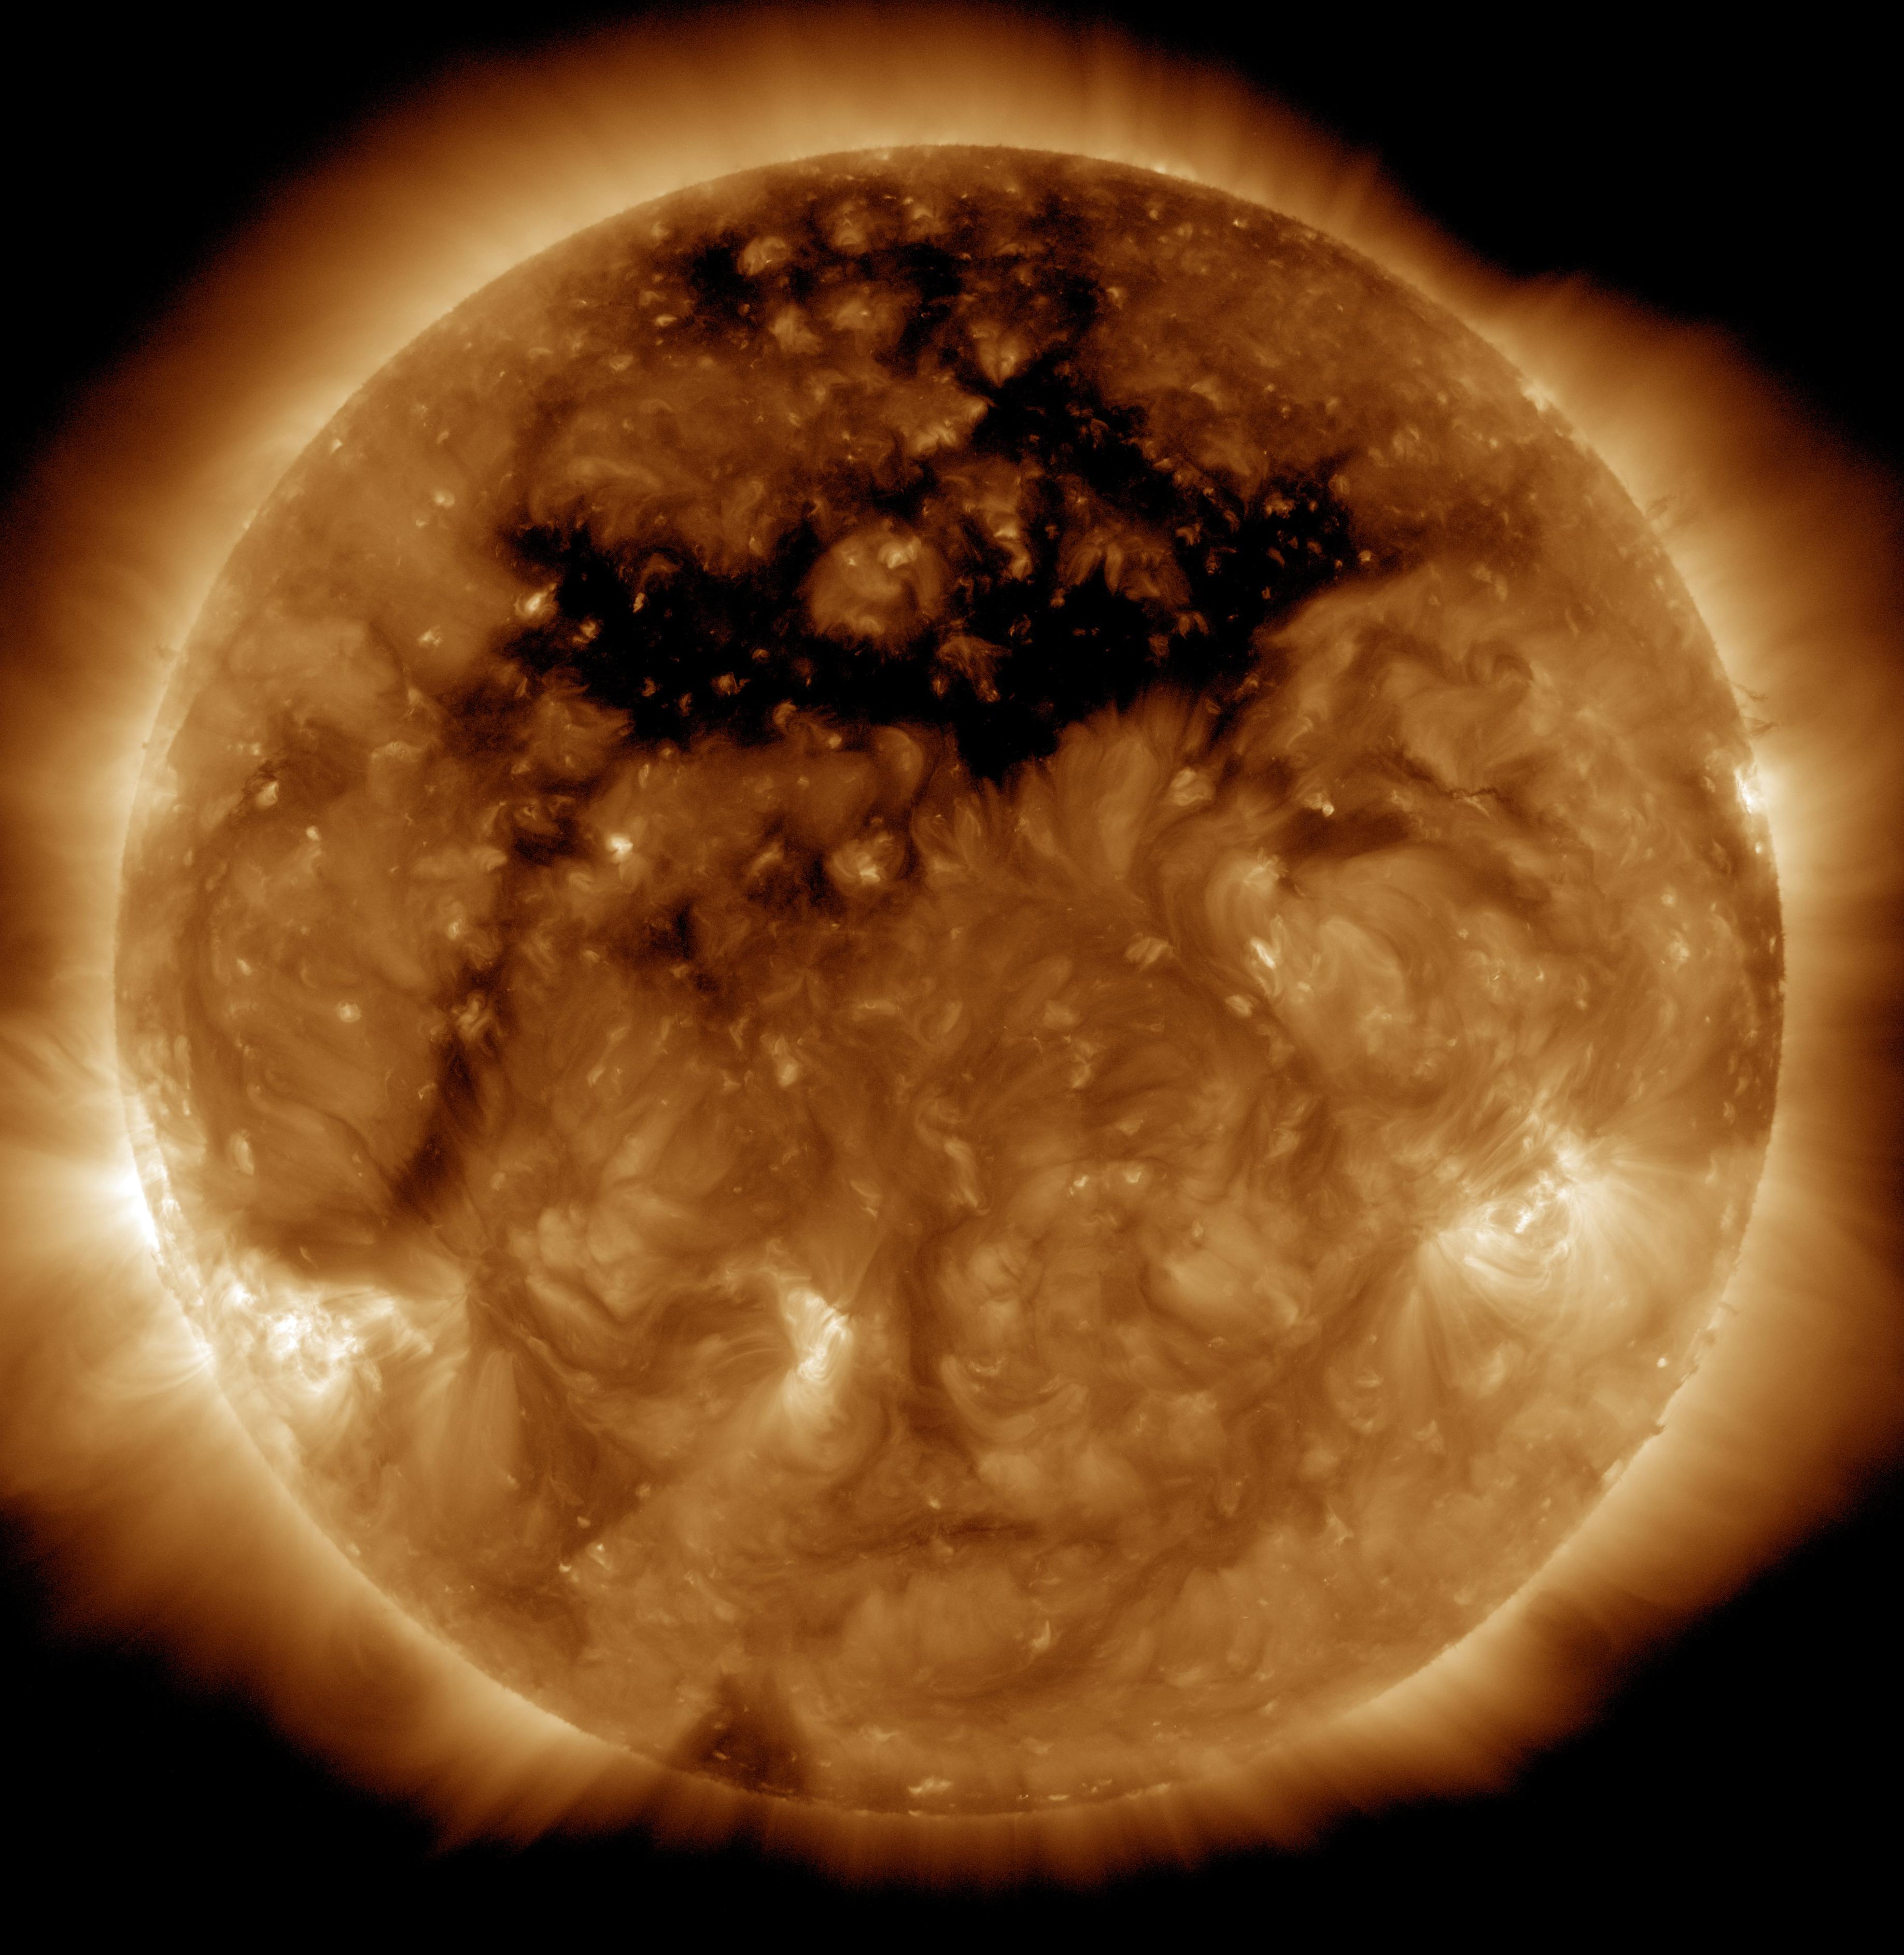 Image credit: NASA/SDO